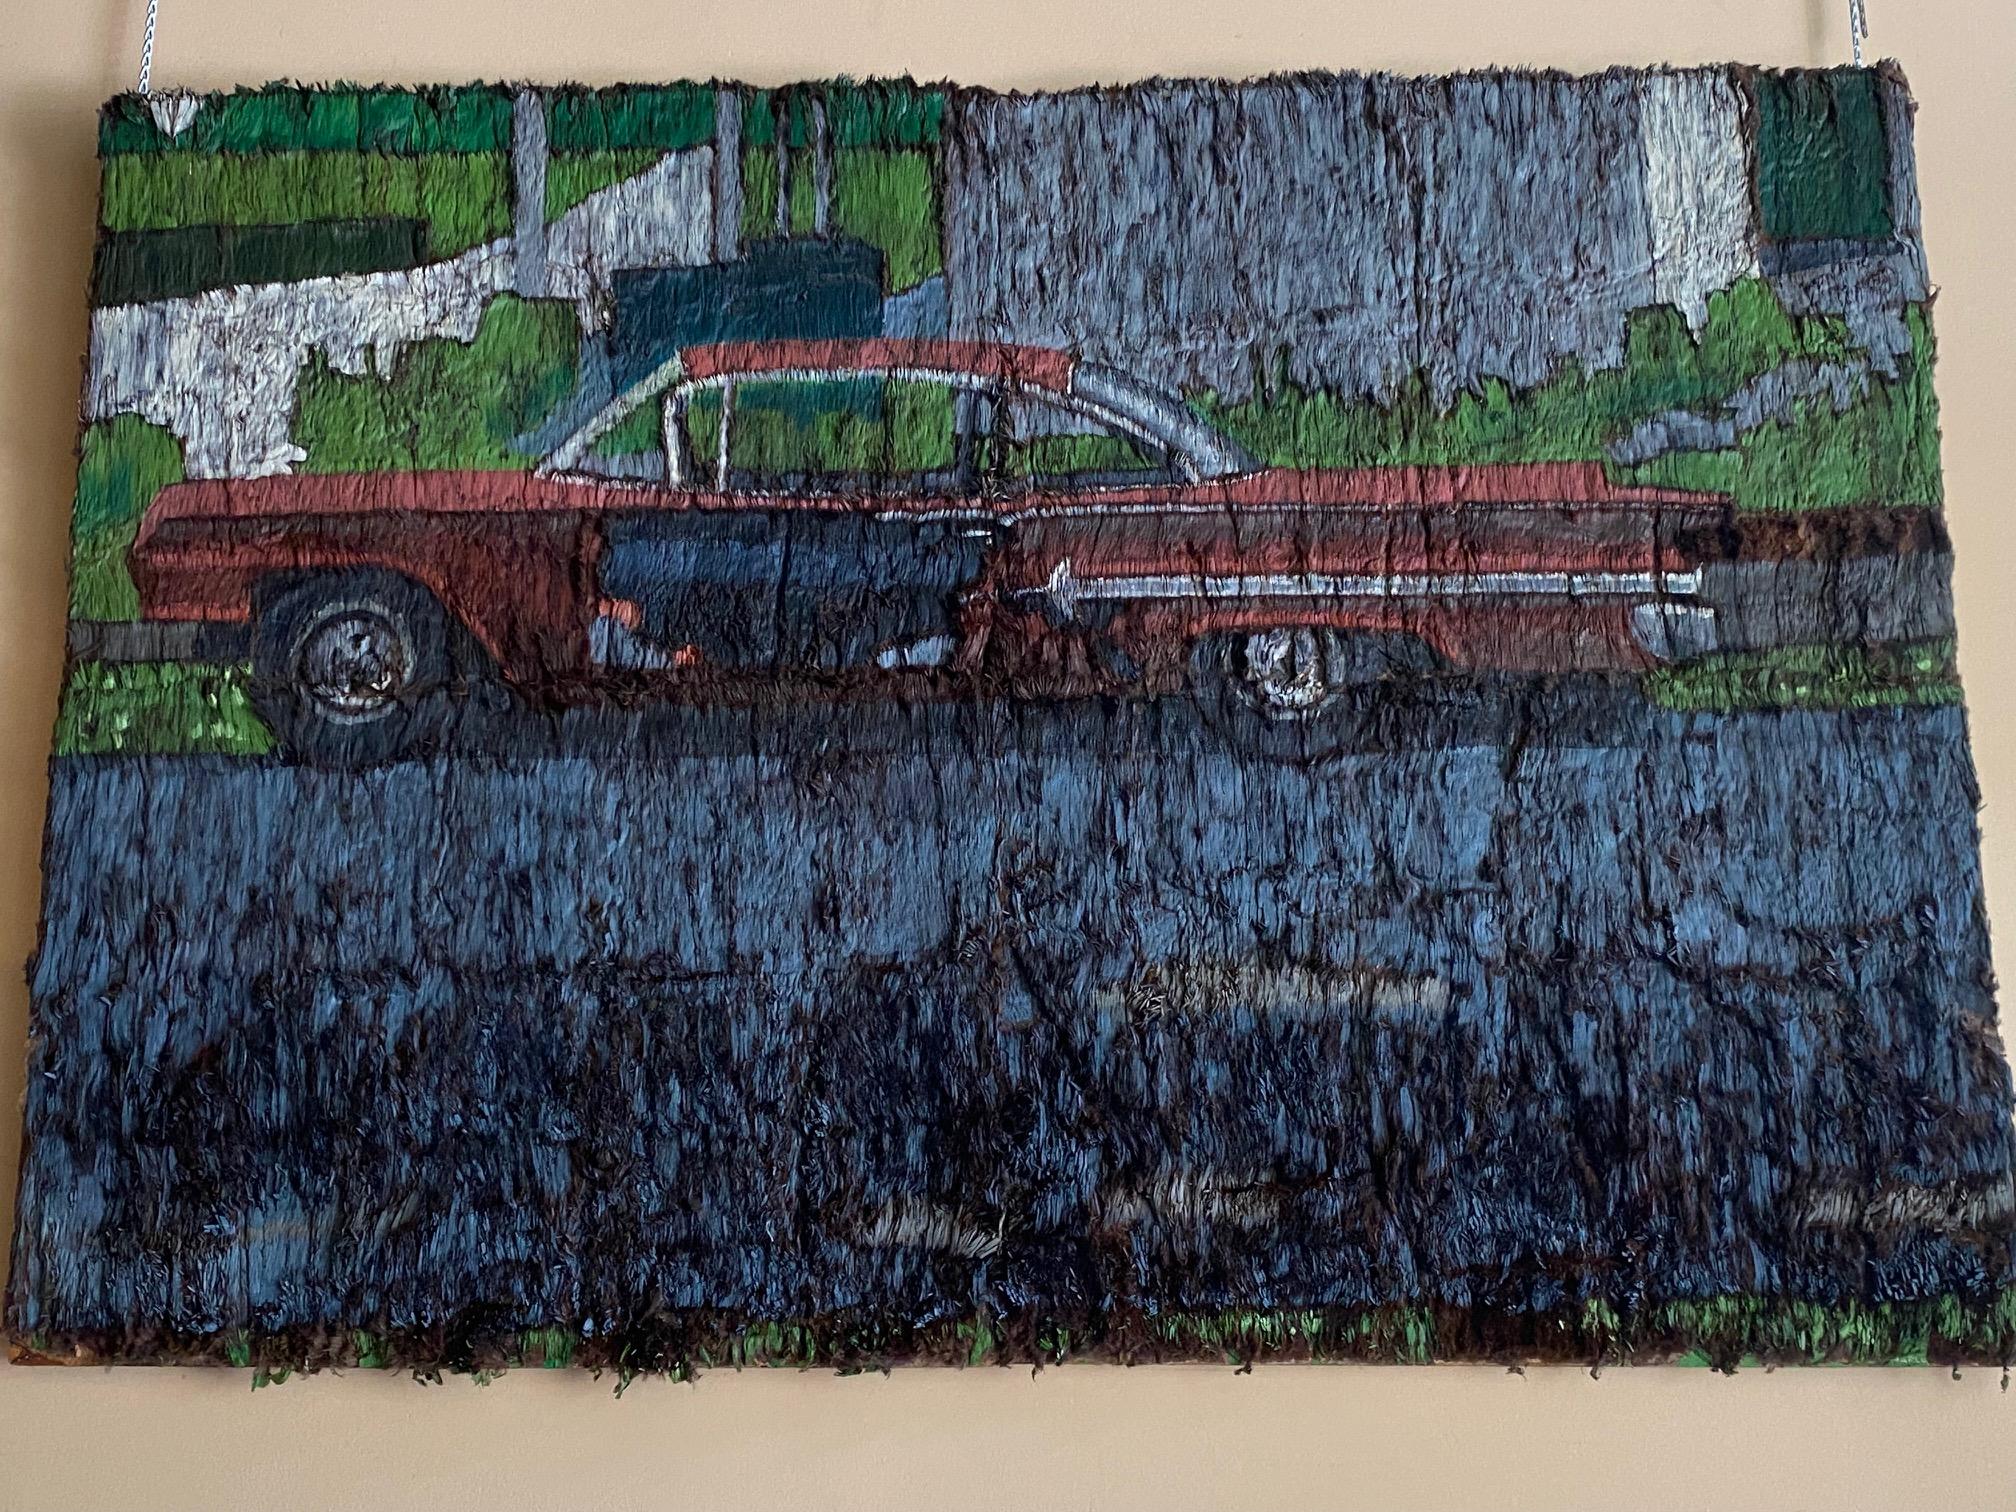 Artwork of a classic car